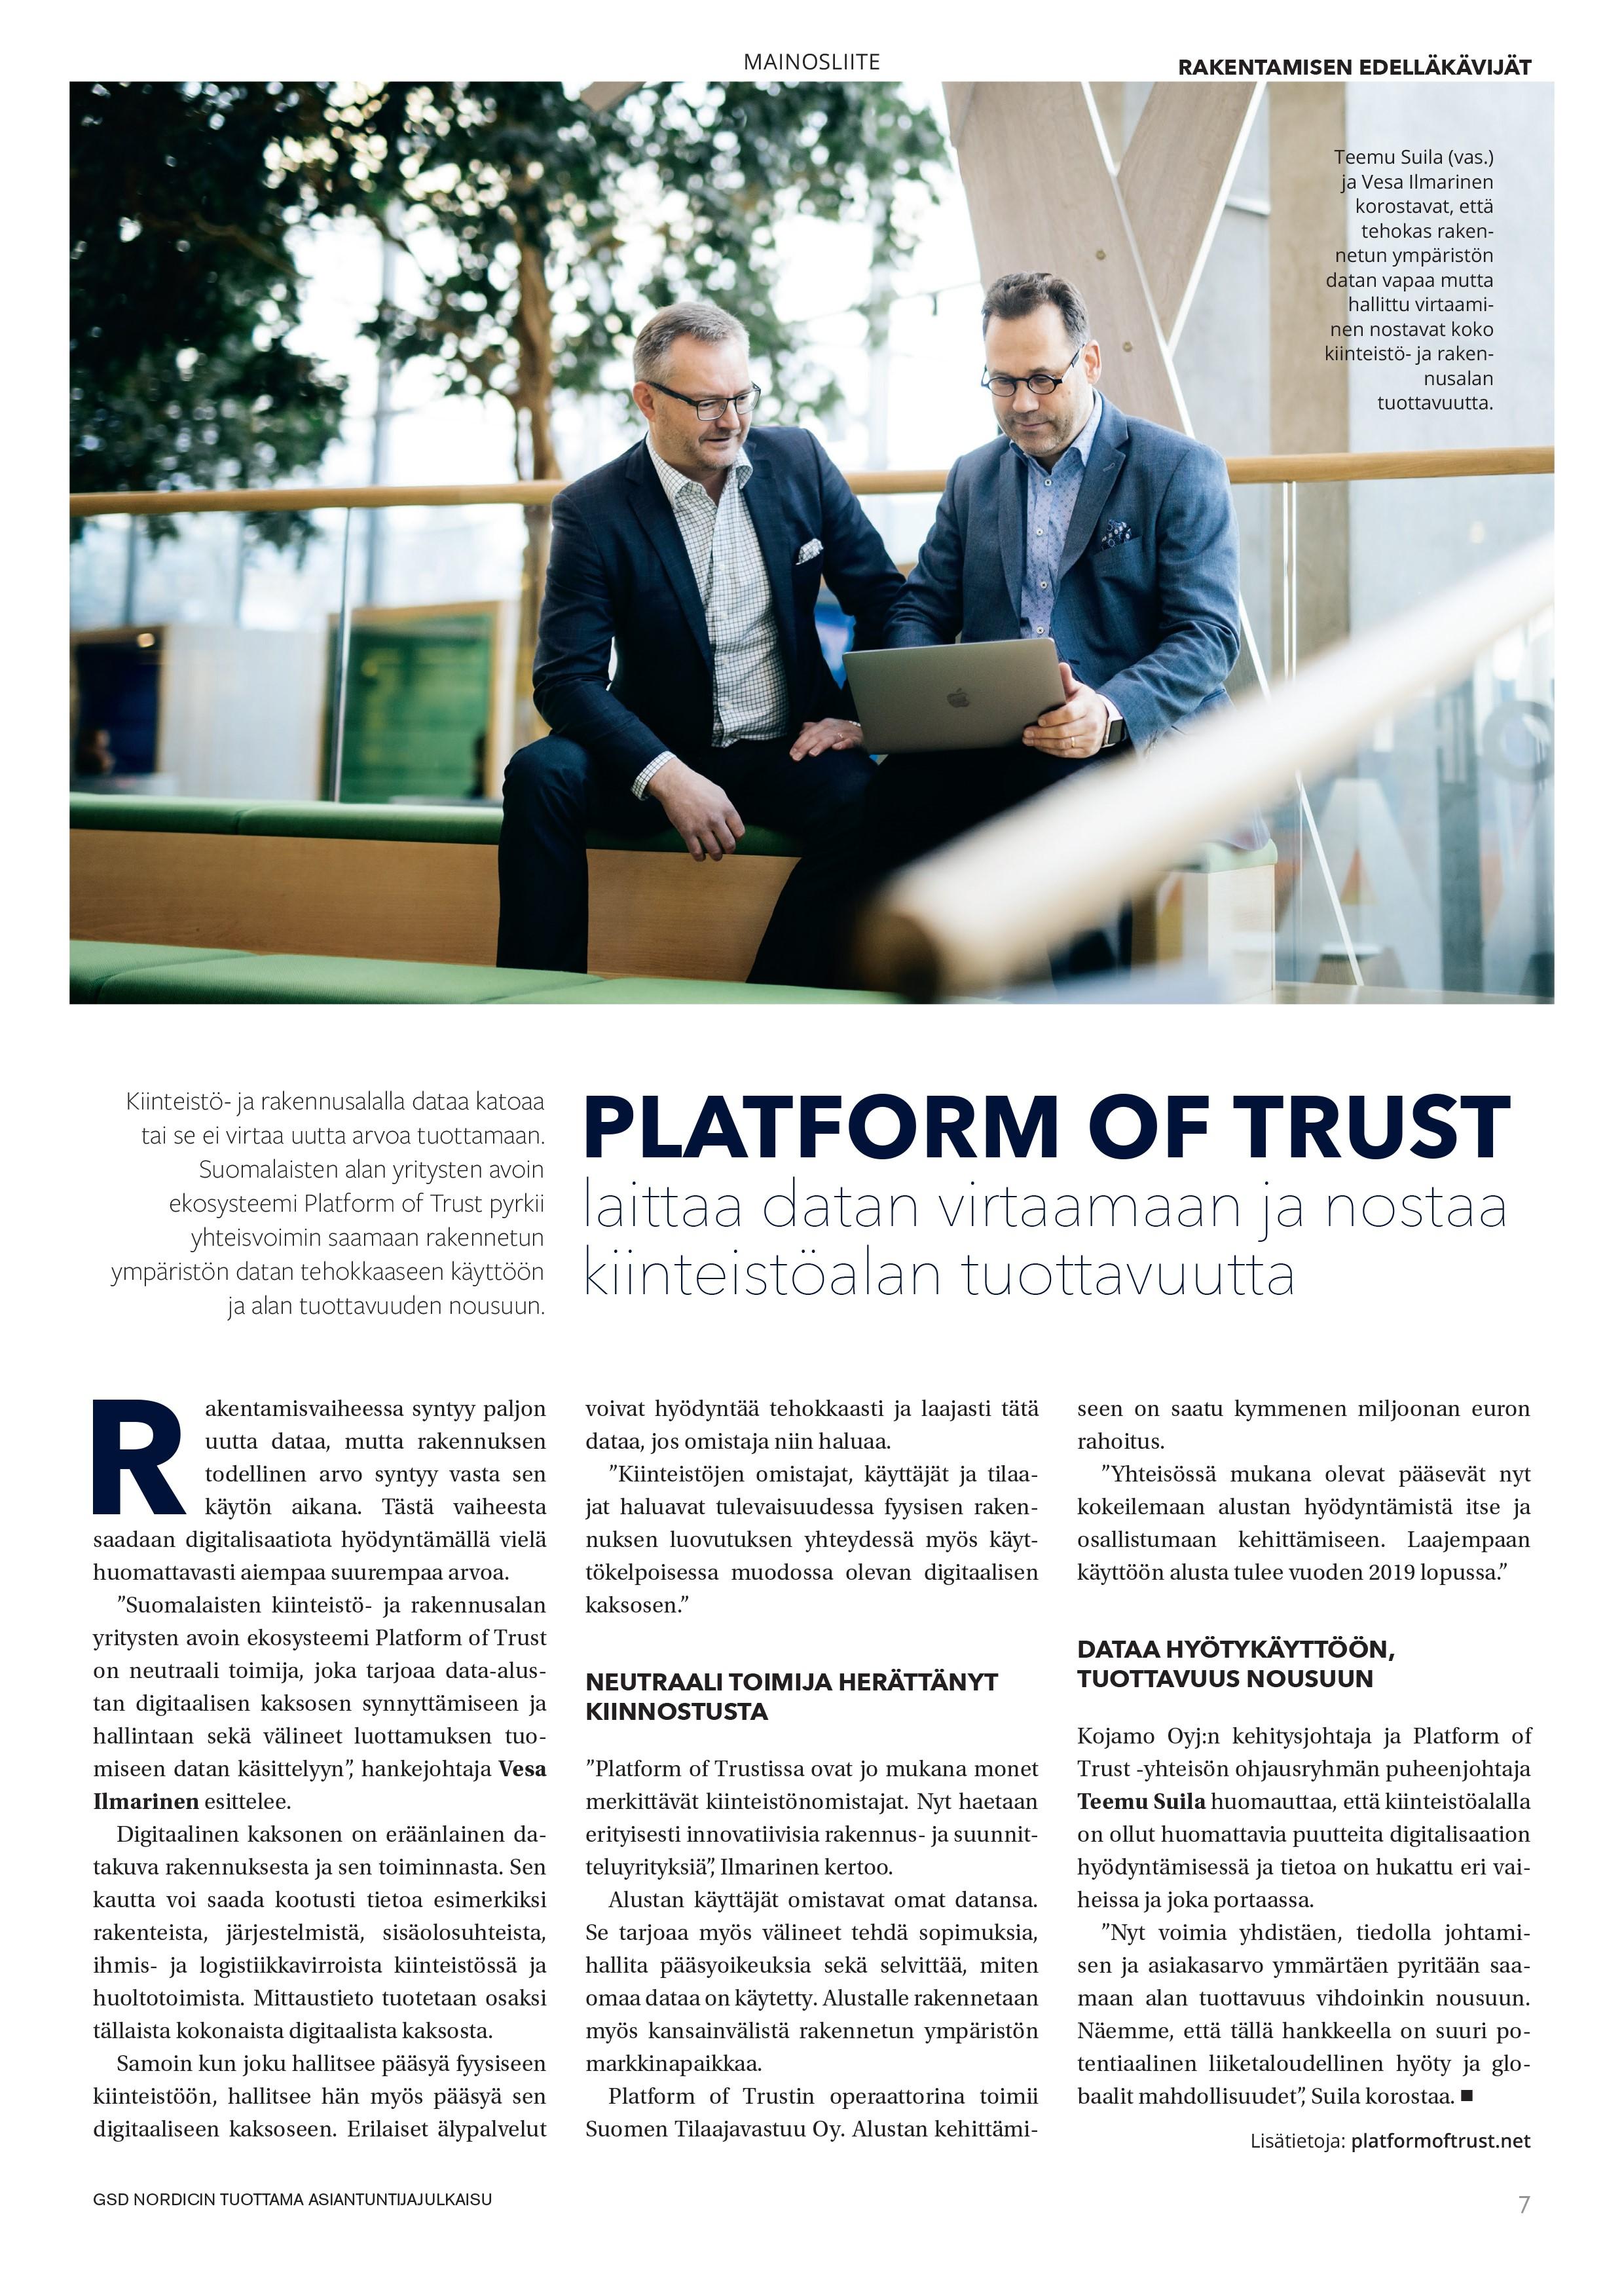 Rakentamisen_edellakavijat_Platform_of_Trust